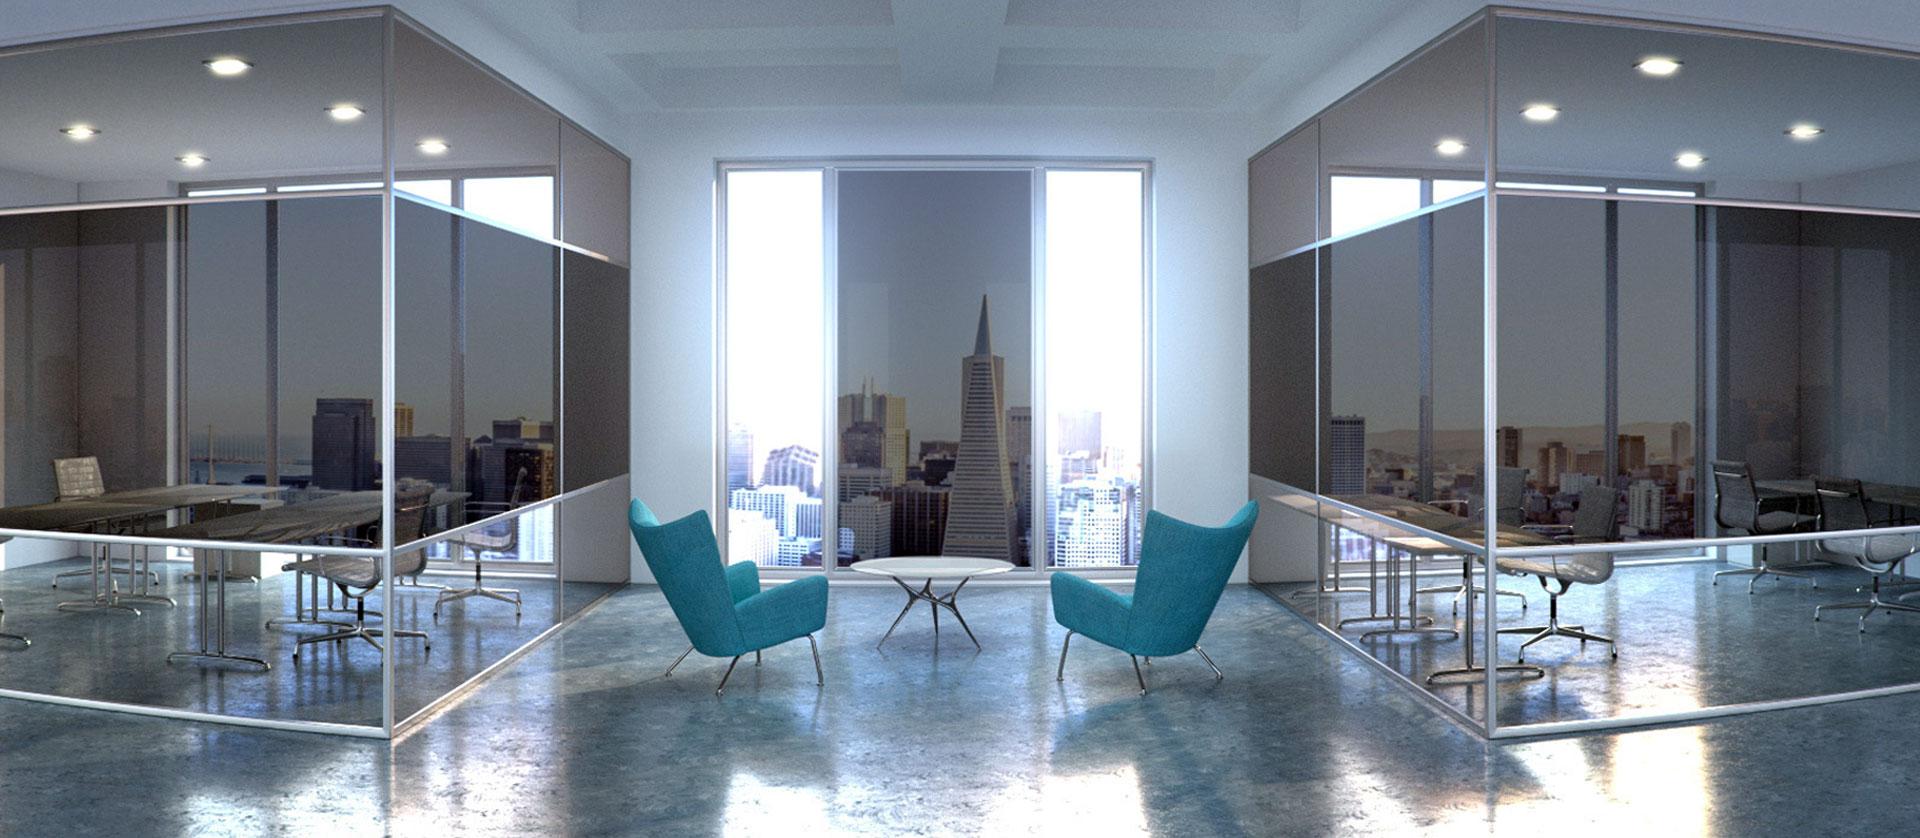 LosAltosGlass-home-banner-7